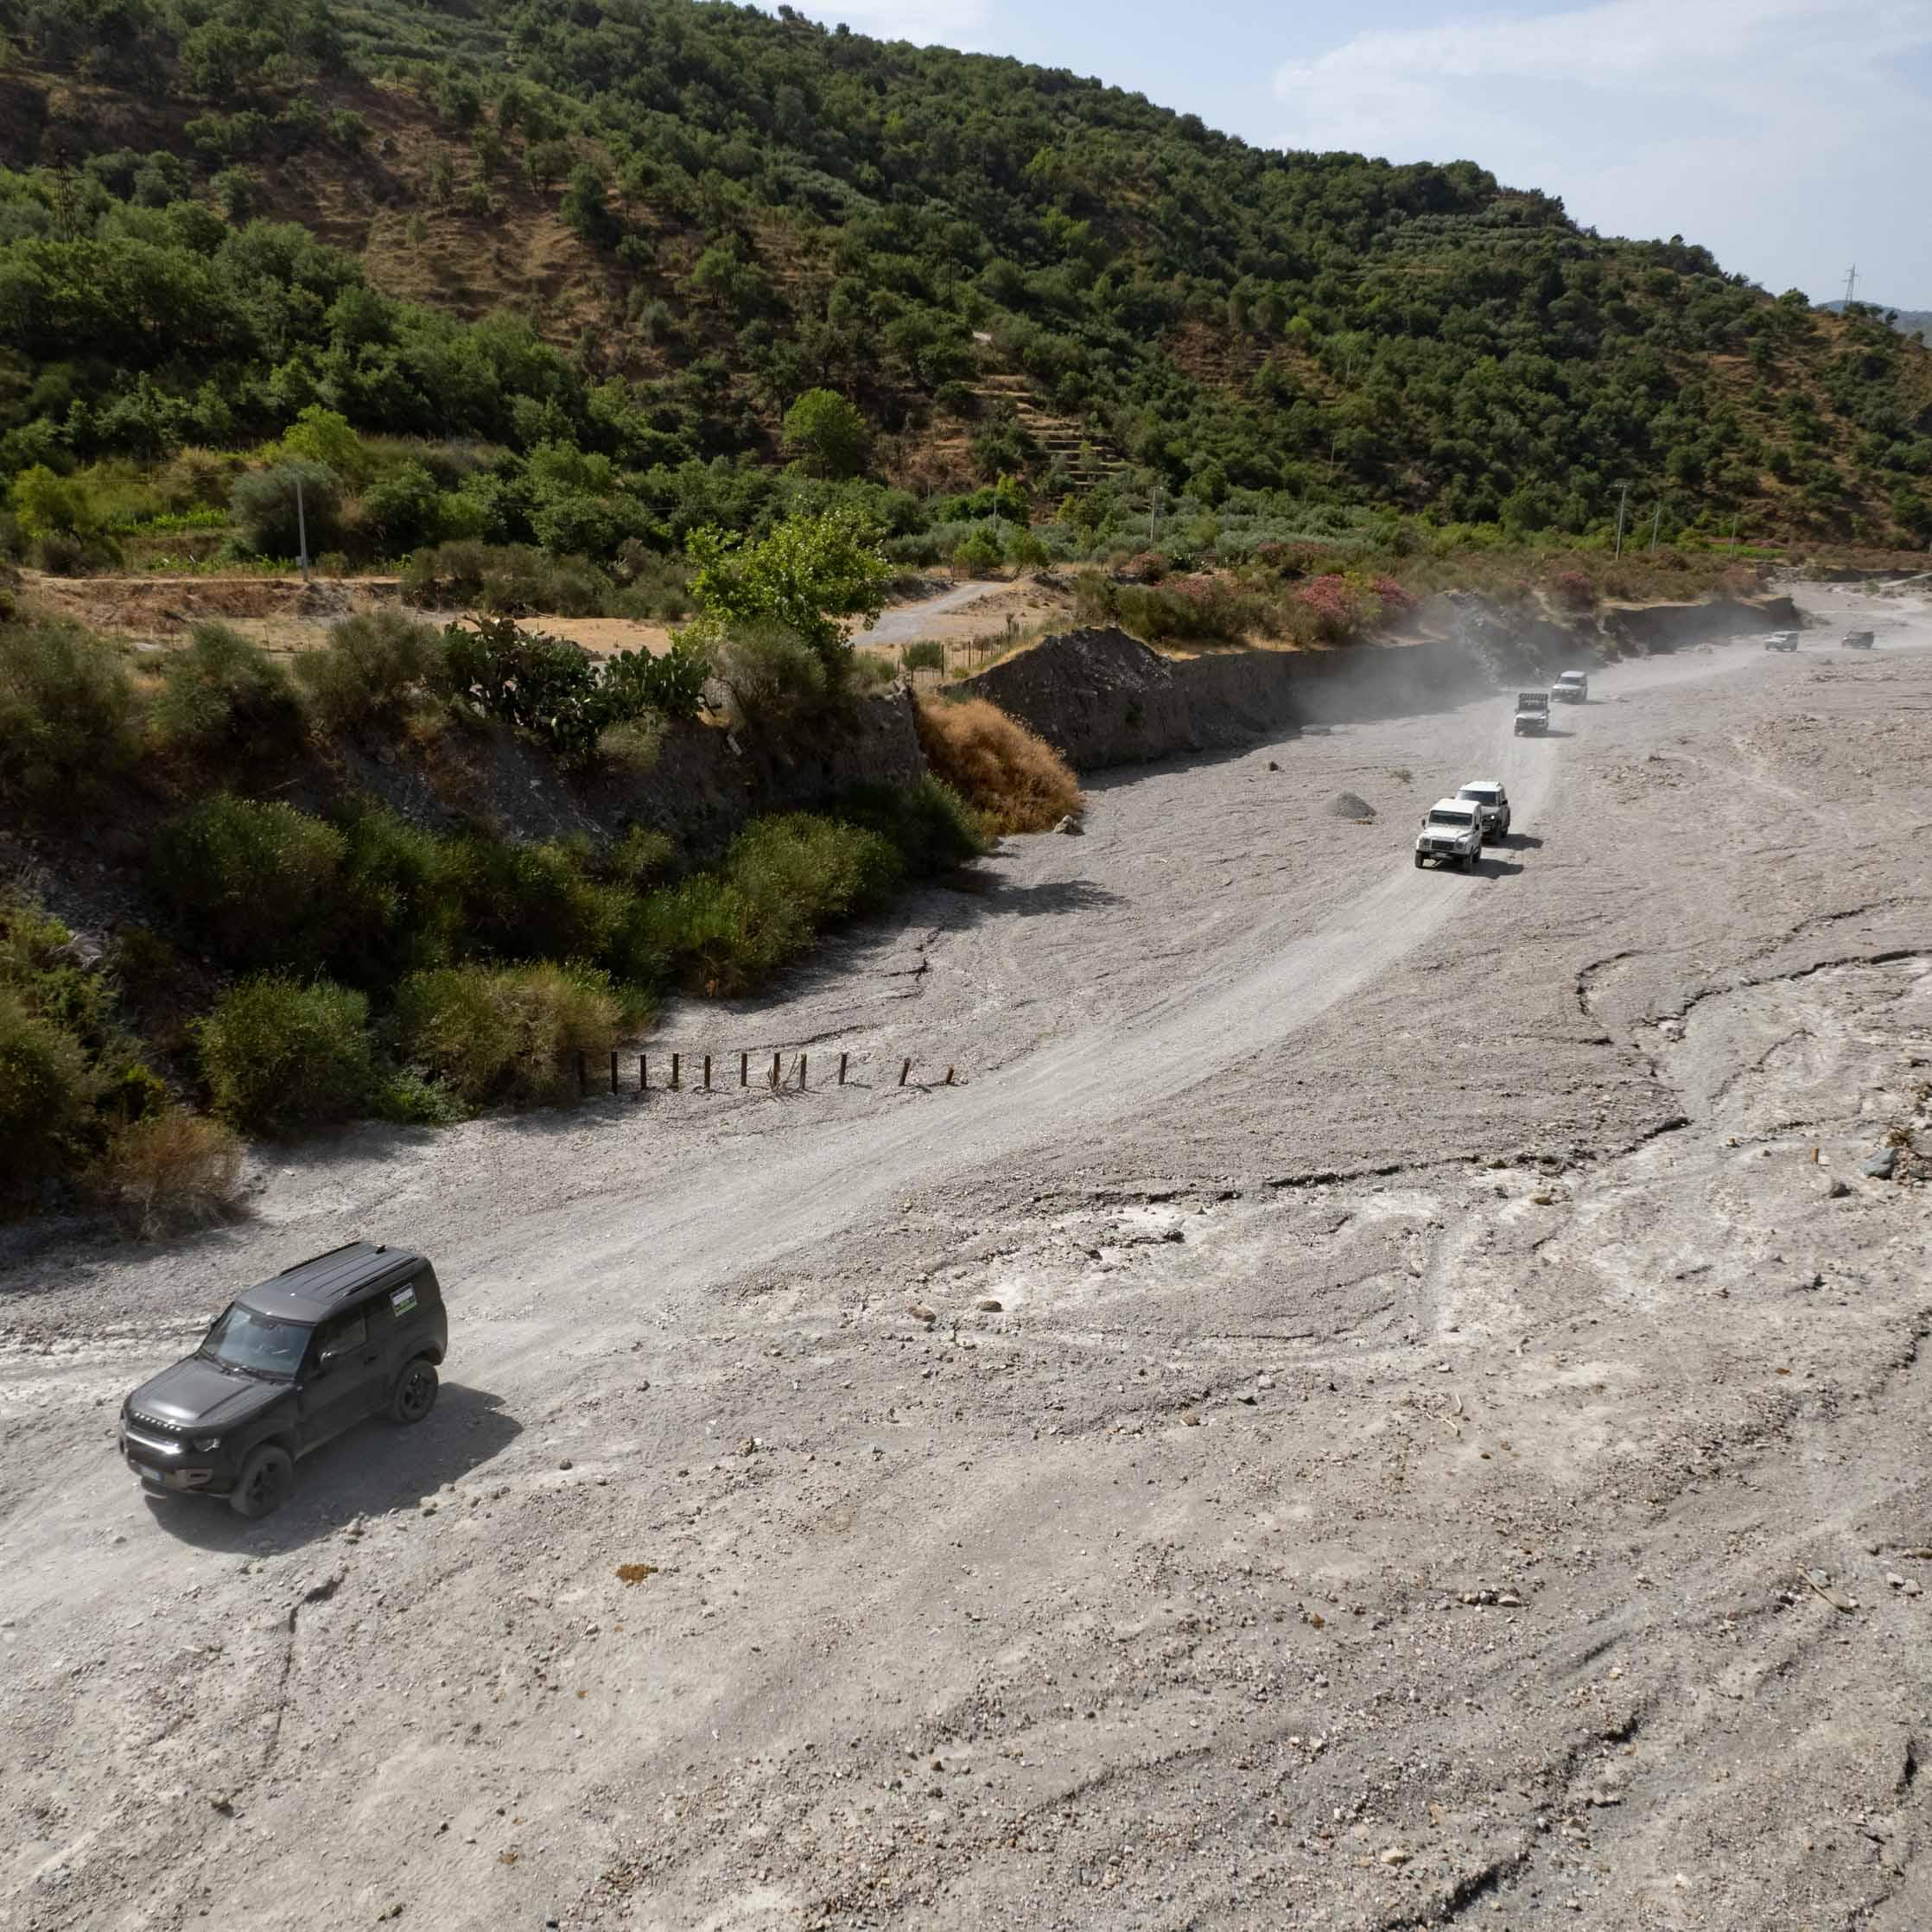 Land_Rover_Tour_Sicilia_2021_Land_Rover_Experience_Italia_-3